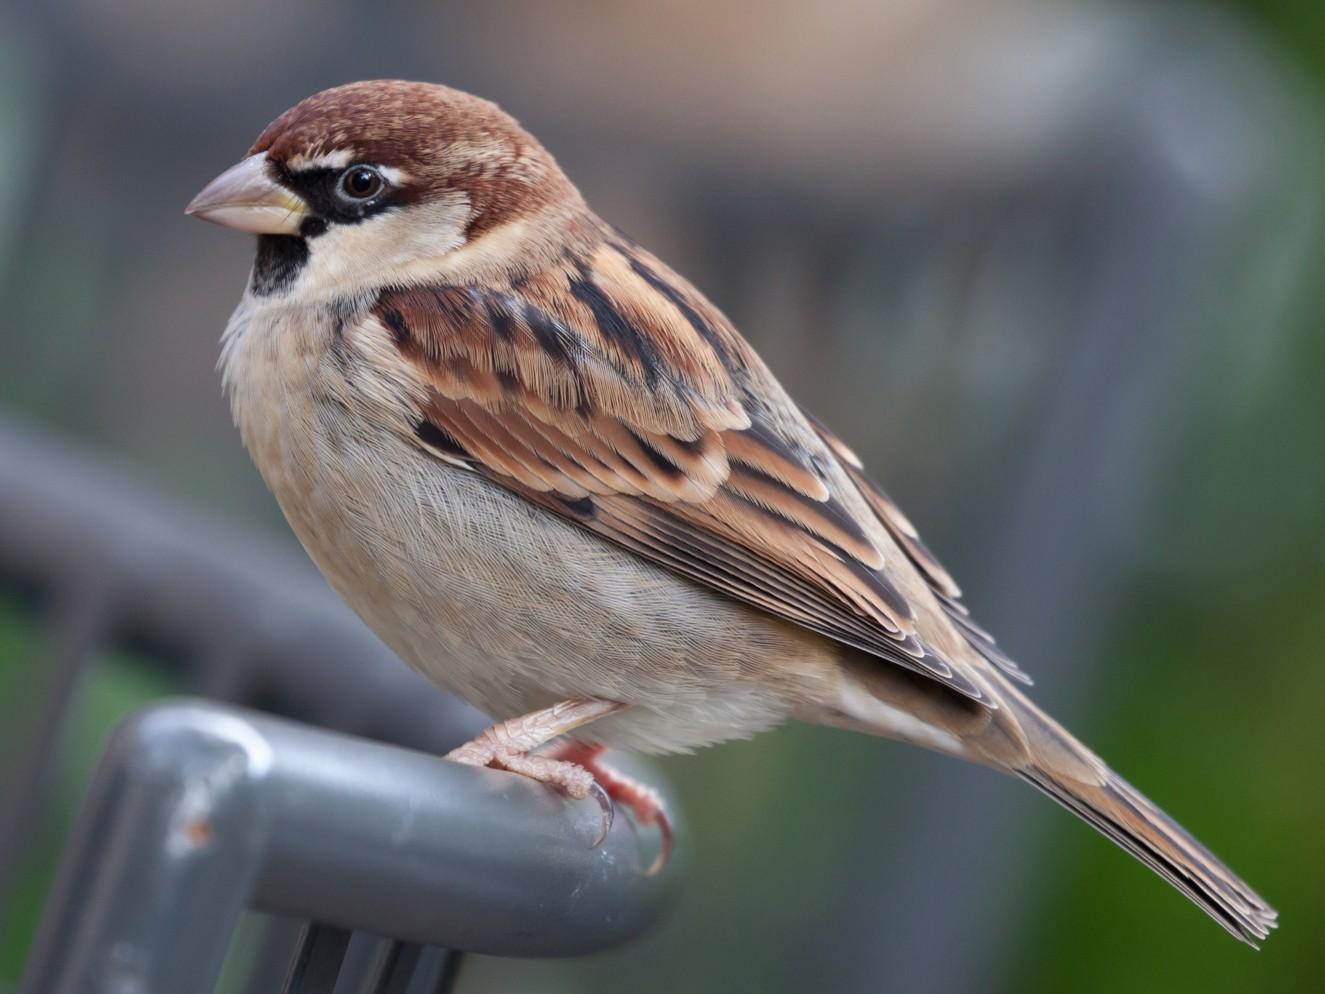 Italian Sparrow - Lutz Duerselen